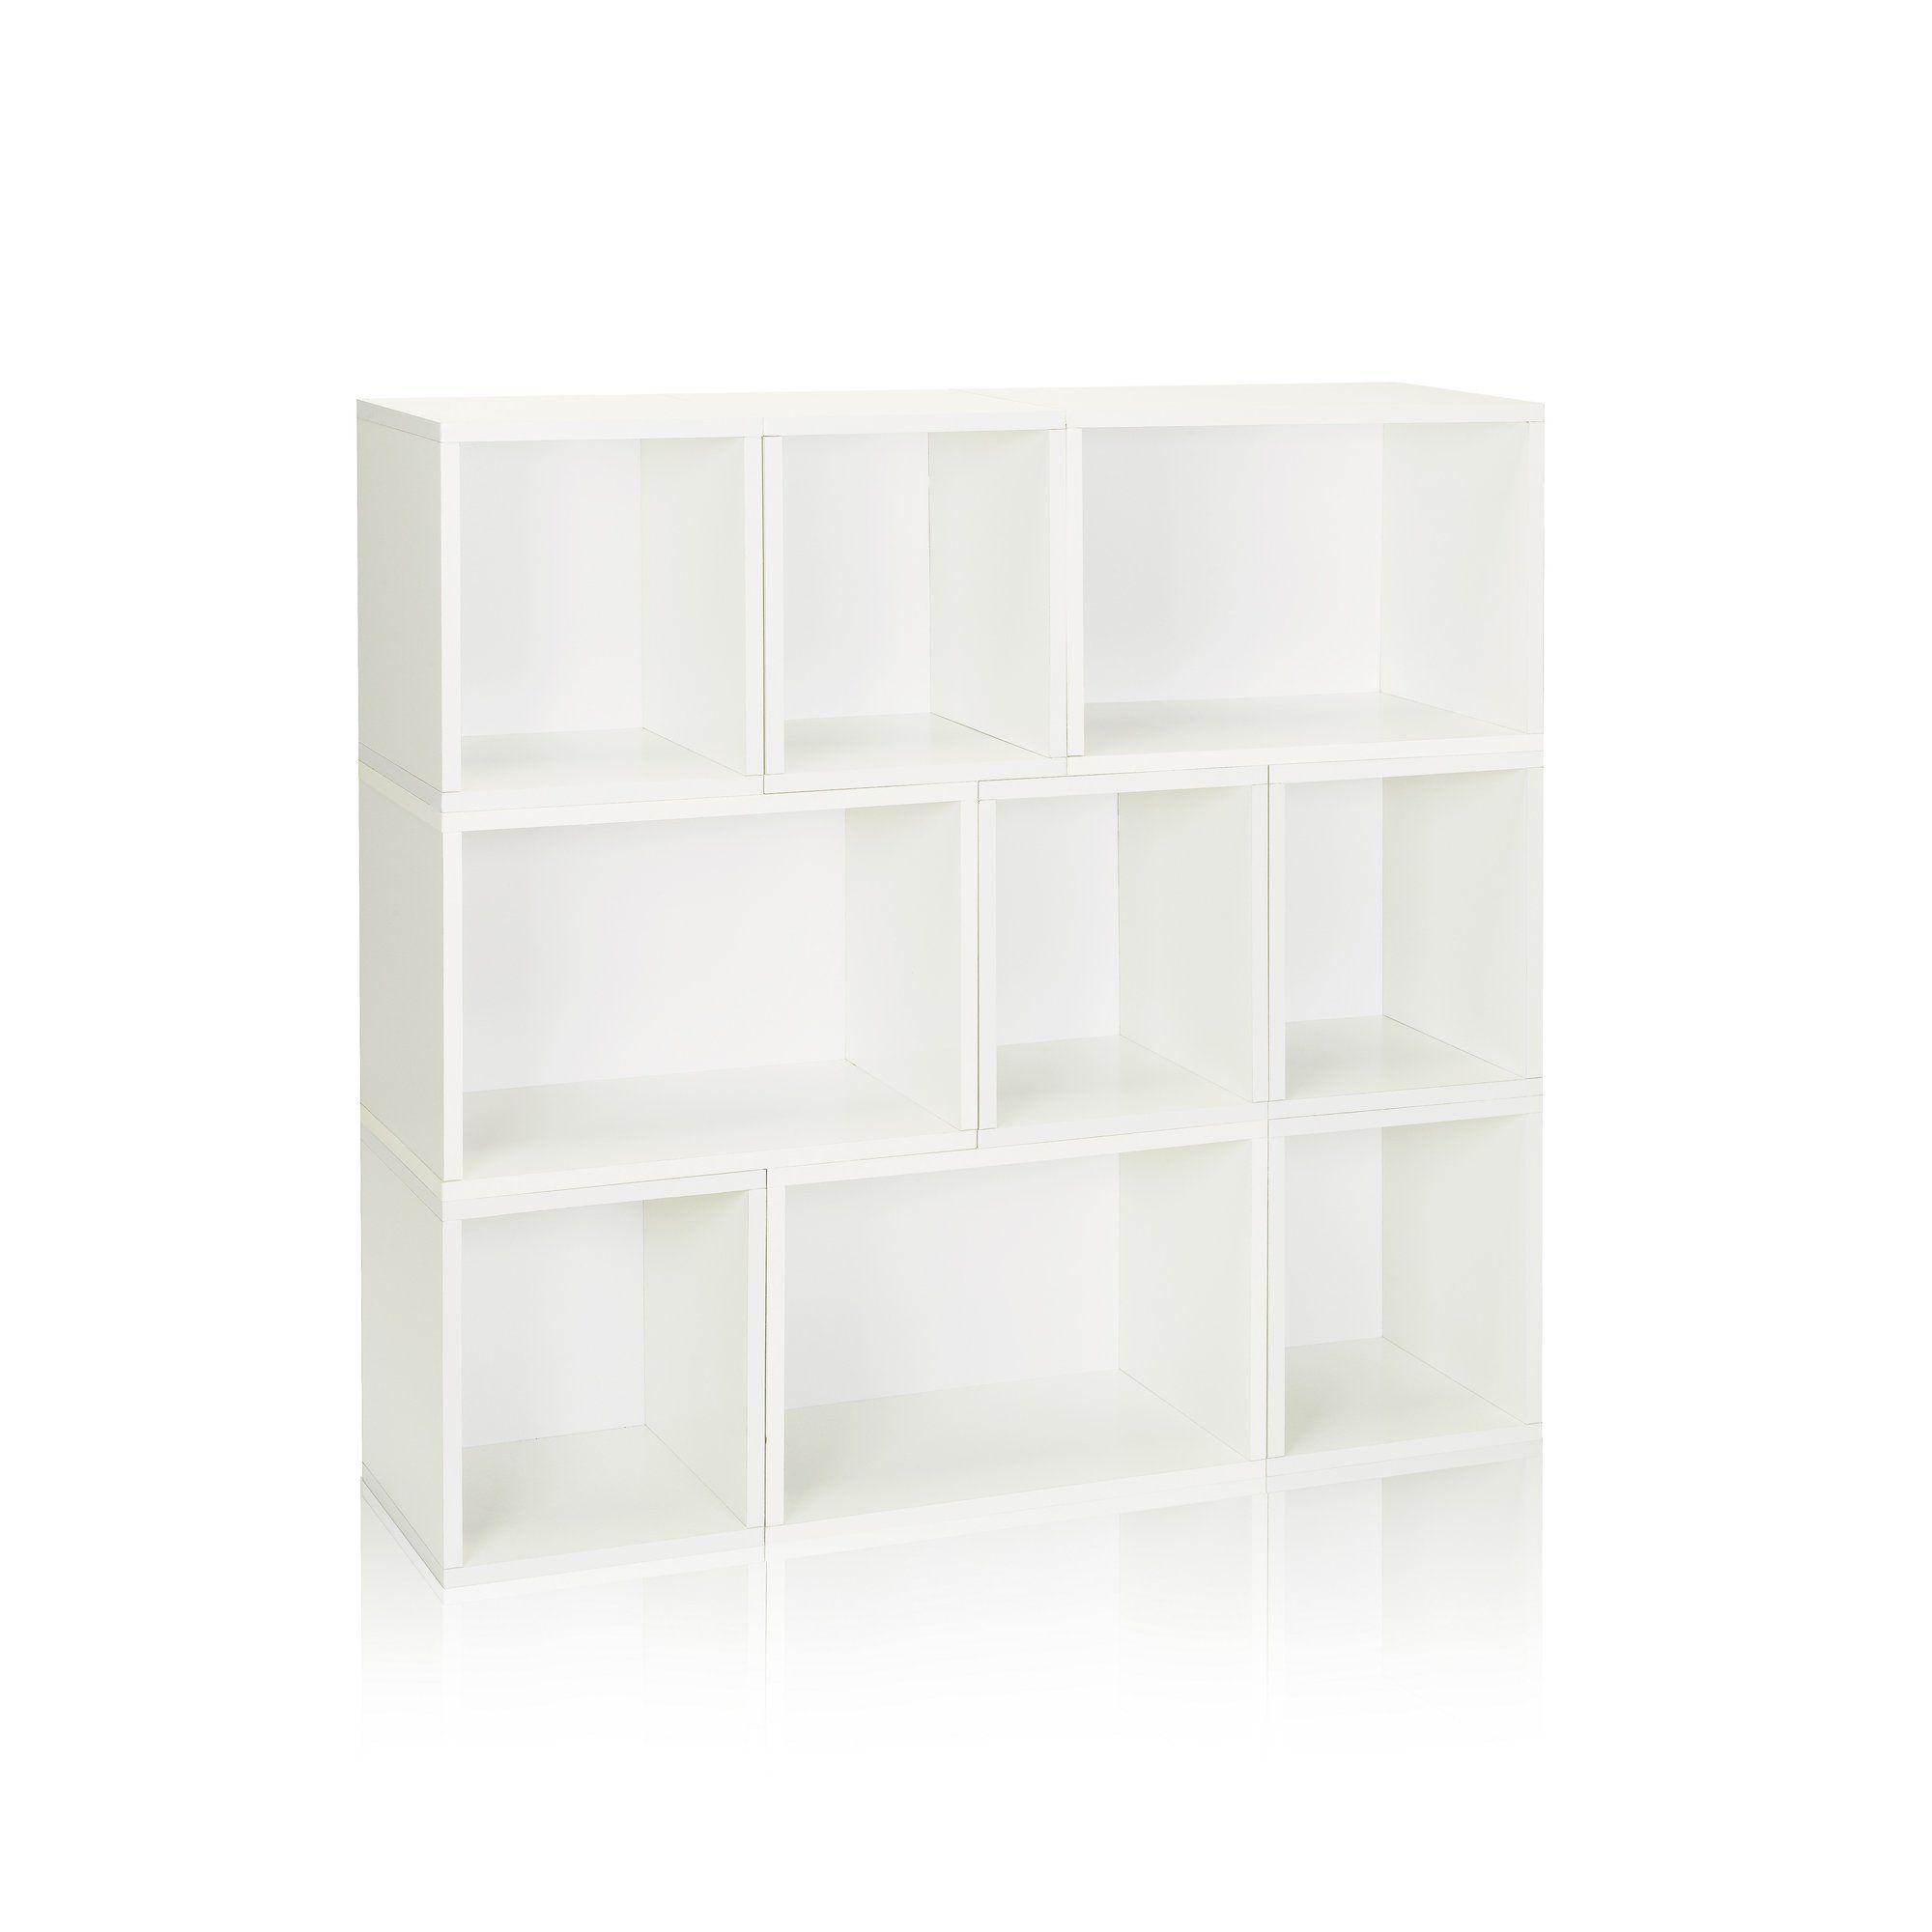 Way basics zboard storage oxford modular organizer cube unit bookcase finish aspen white